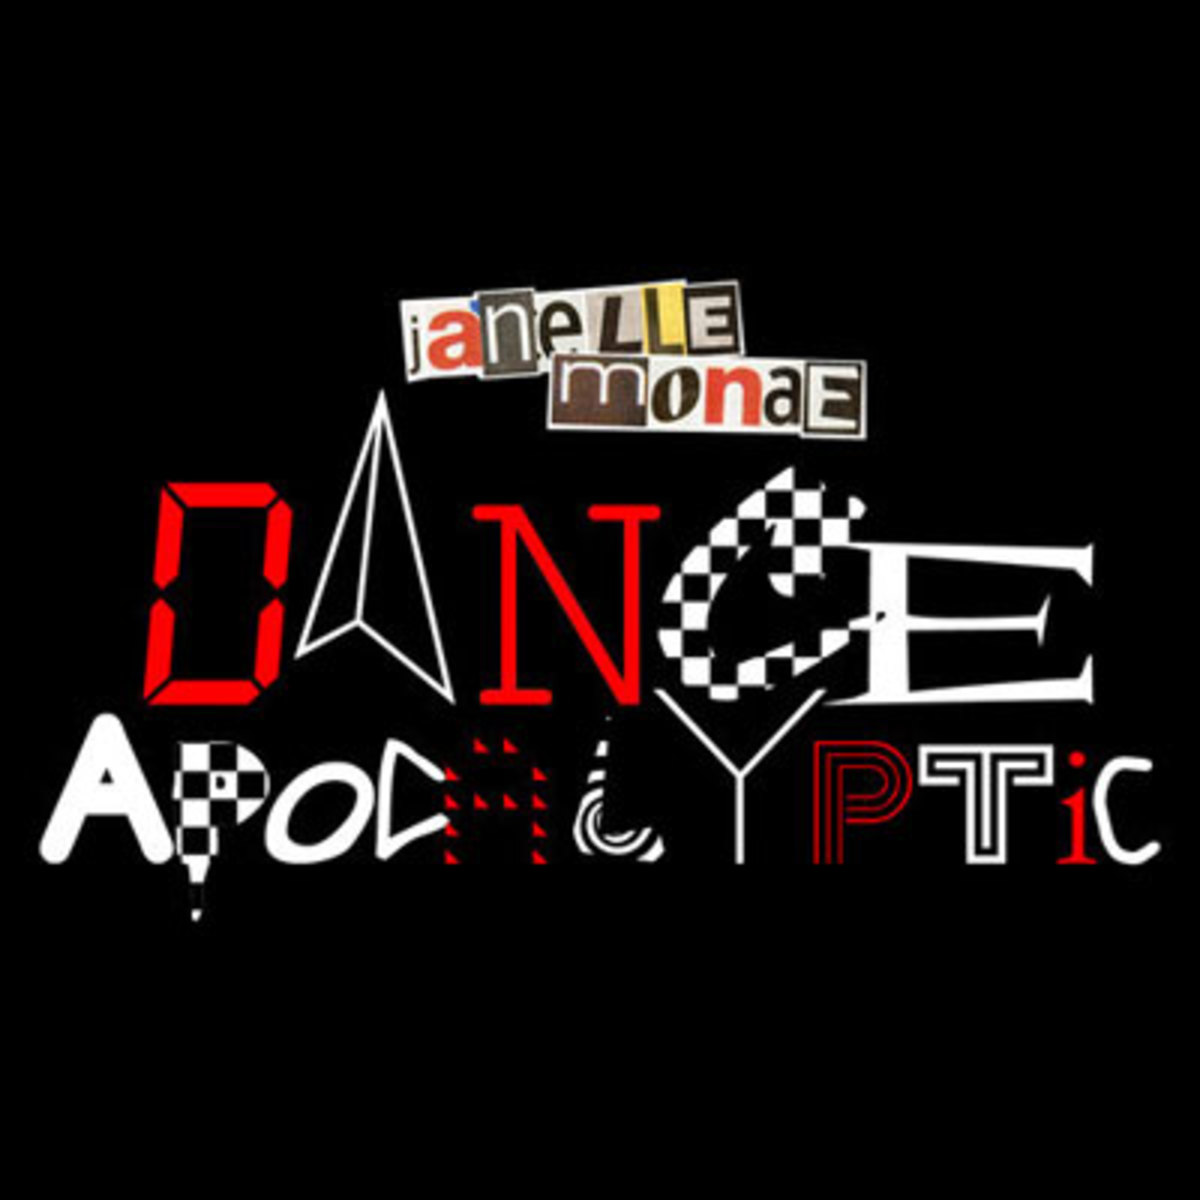 janellemonae-danceapocolyptic.jpg